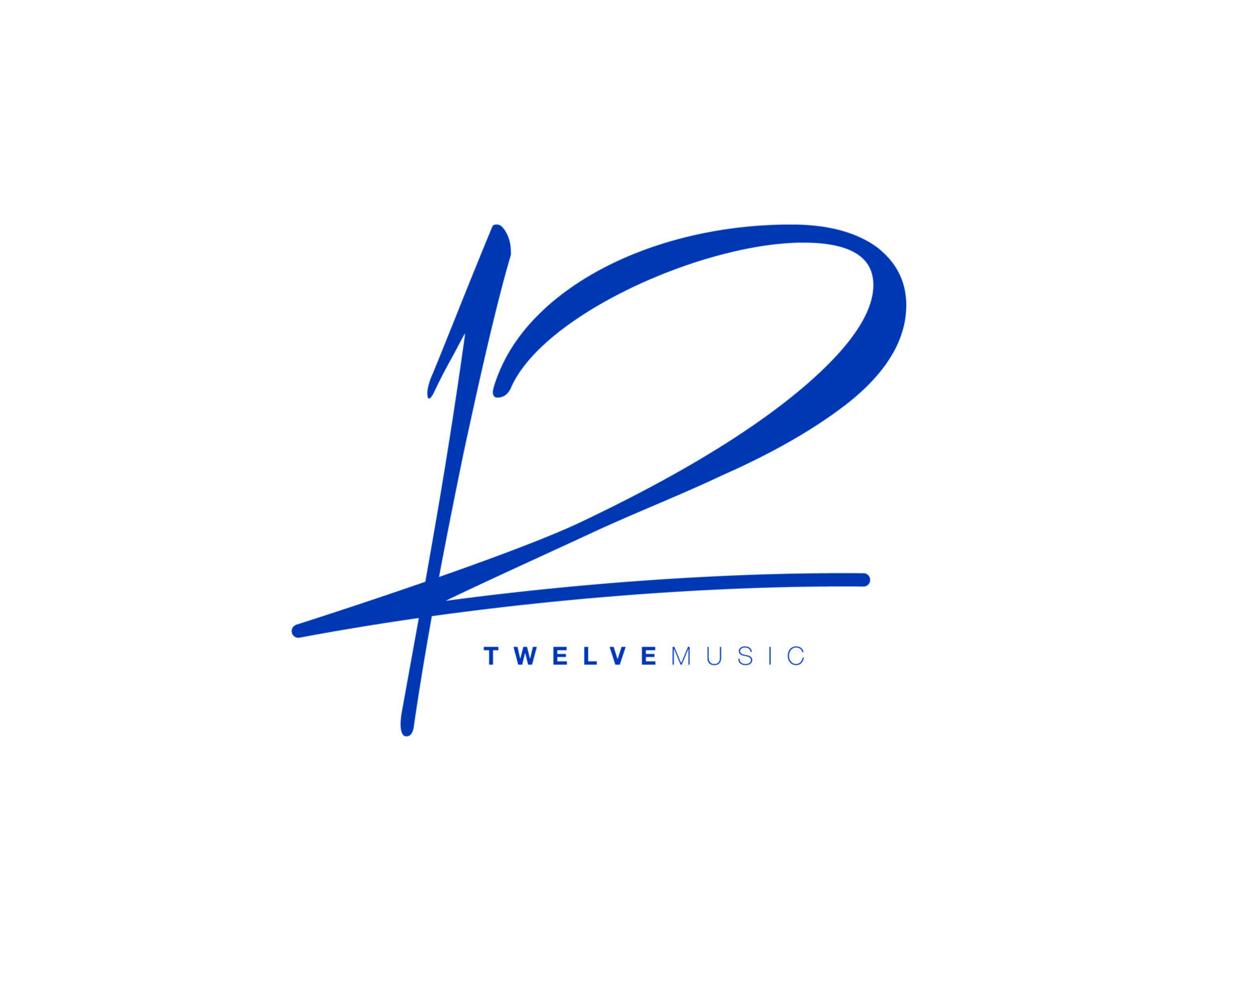 Twelve Music